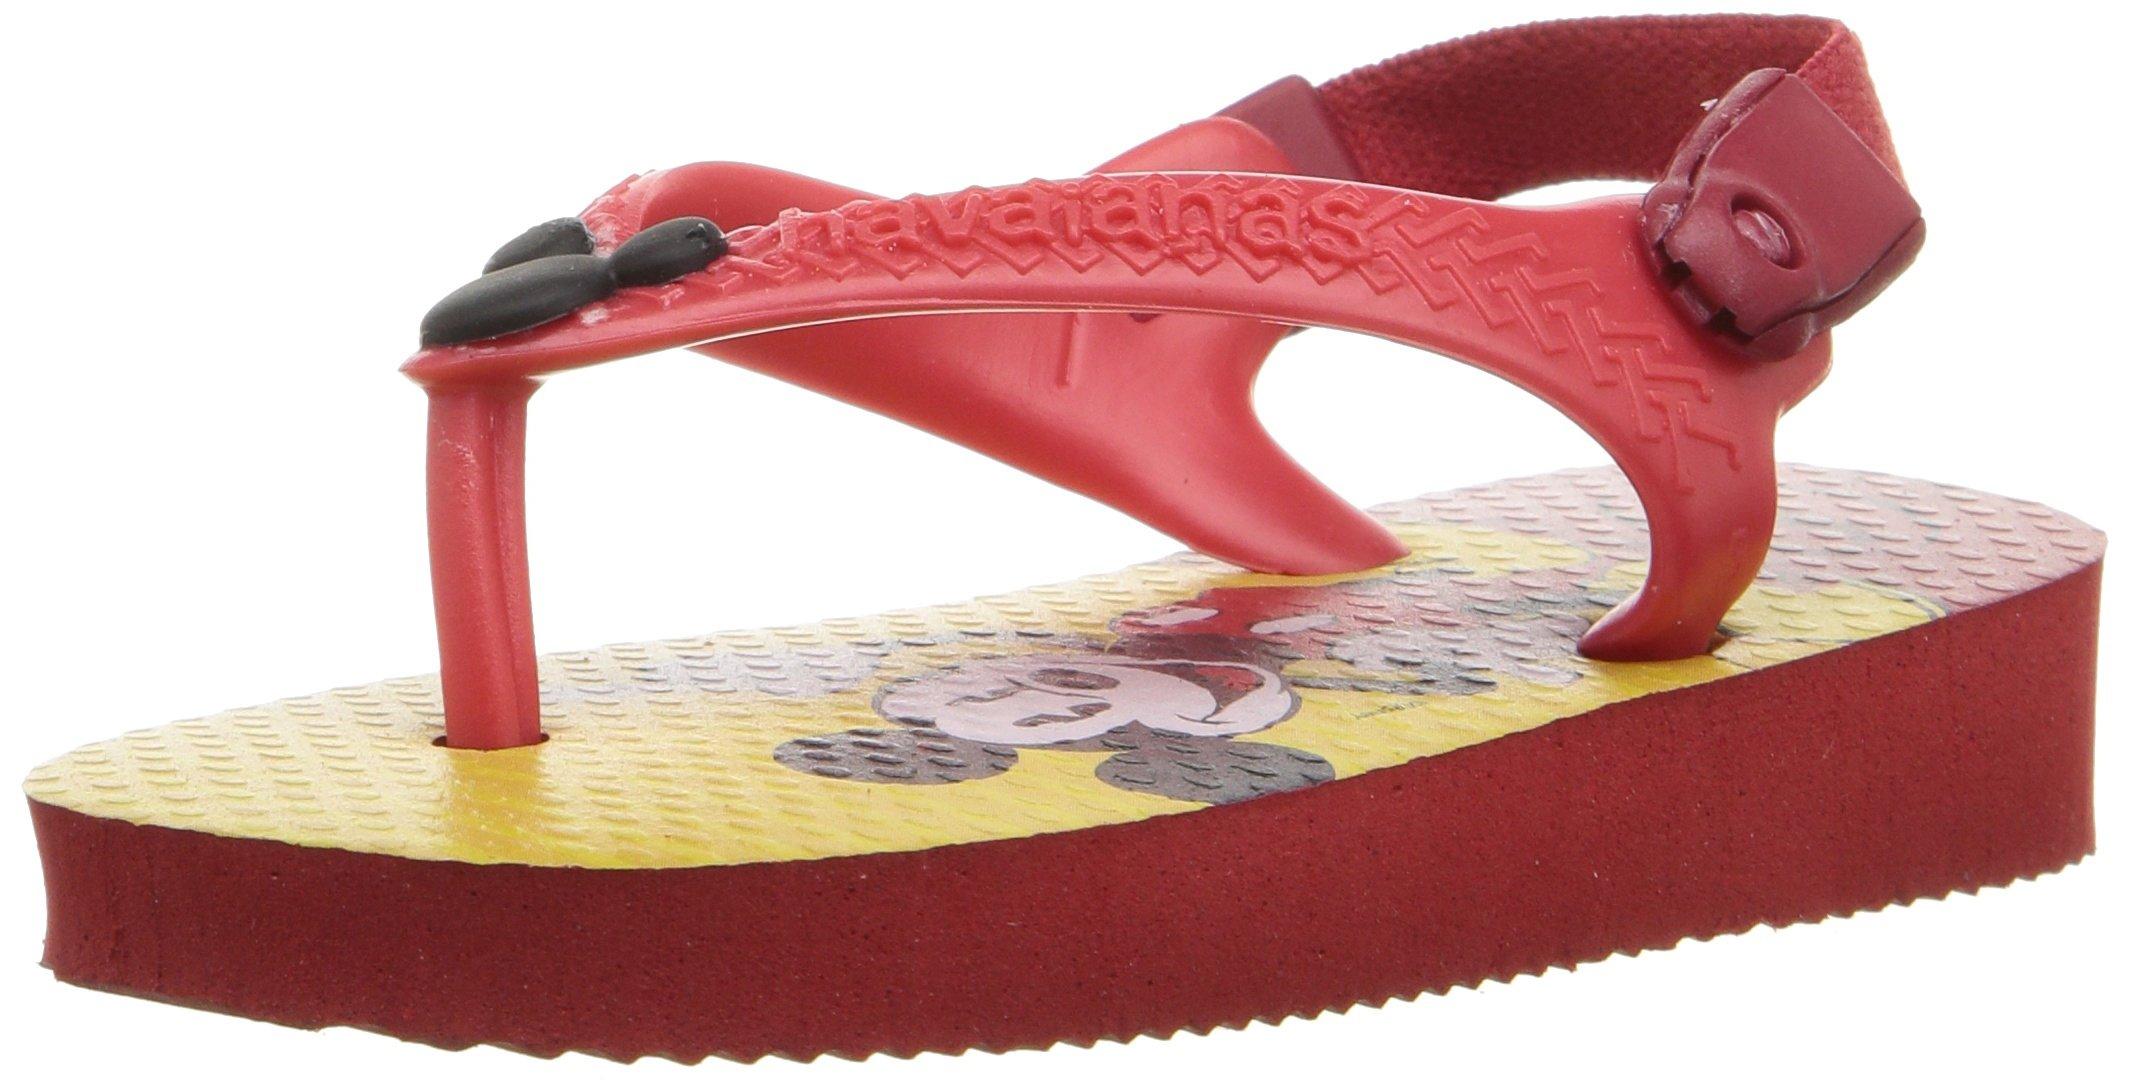 Havaianas Kids Flip Flop Sandals, Disney Classics, Donald Duck, Ice Blue ,Red/Black,20 BR (6 M US Toddler)